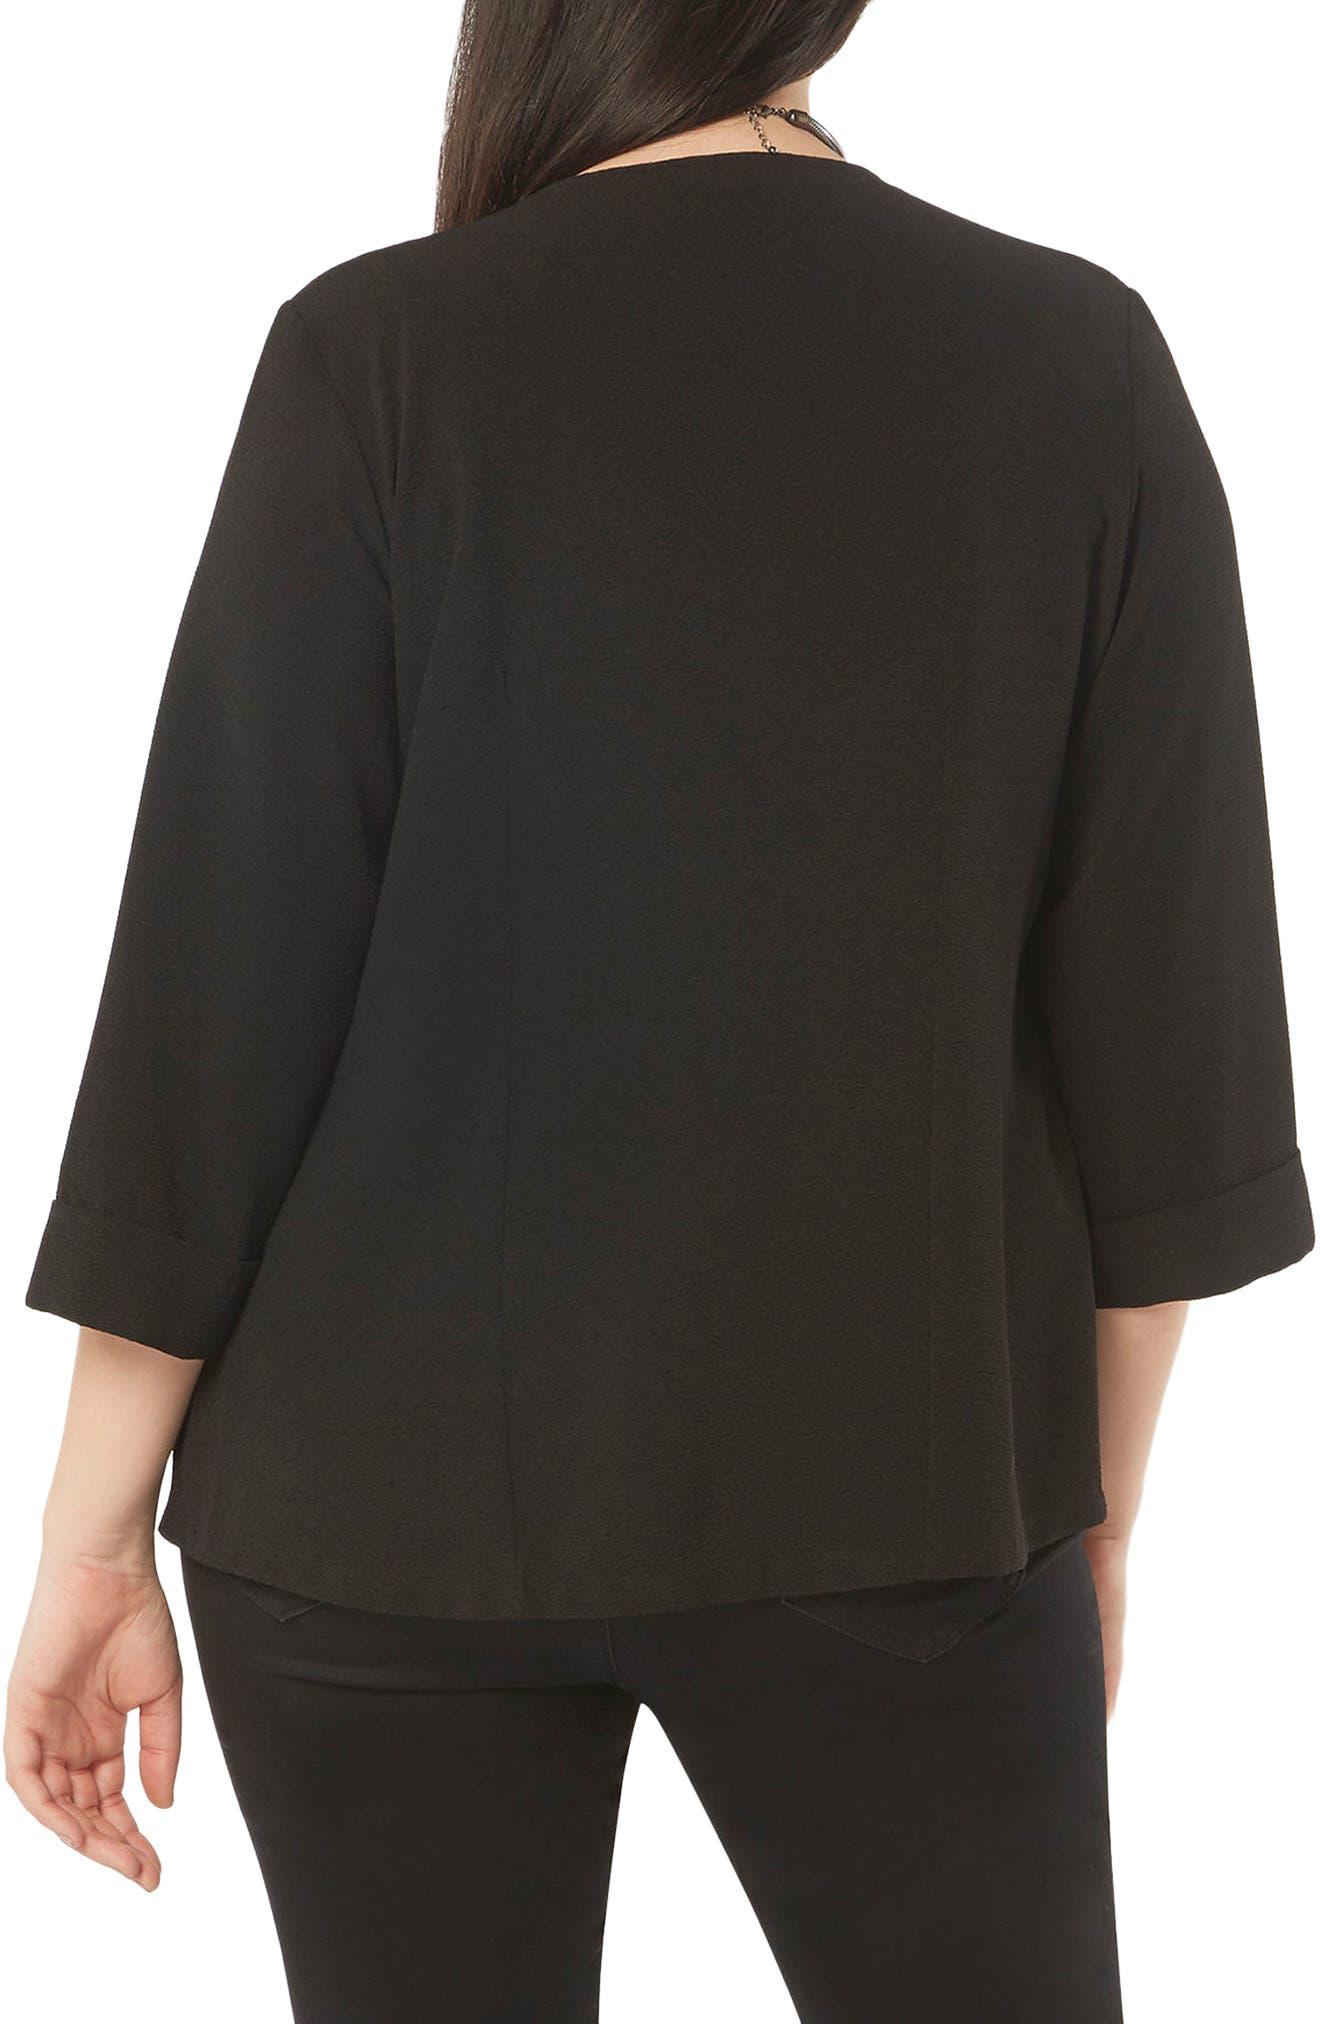 Alternate Image 2  - Evans Crepe Panel Jacket (Plus Size)